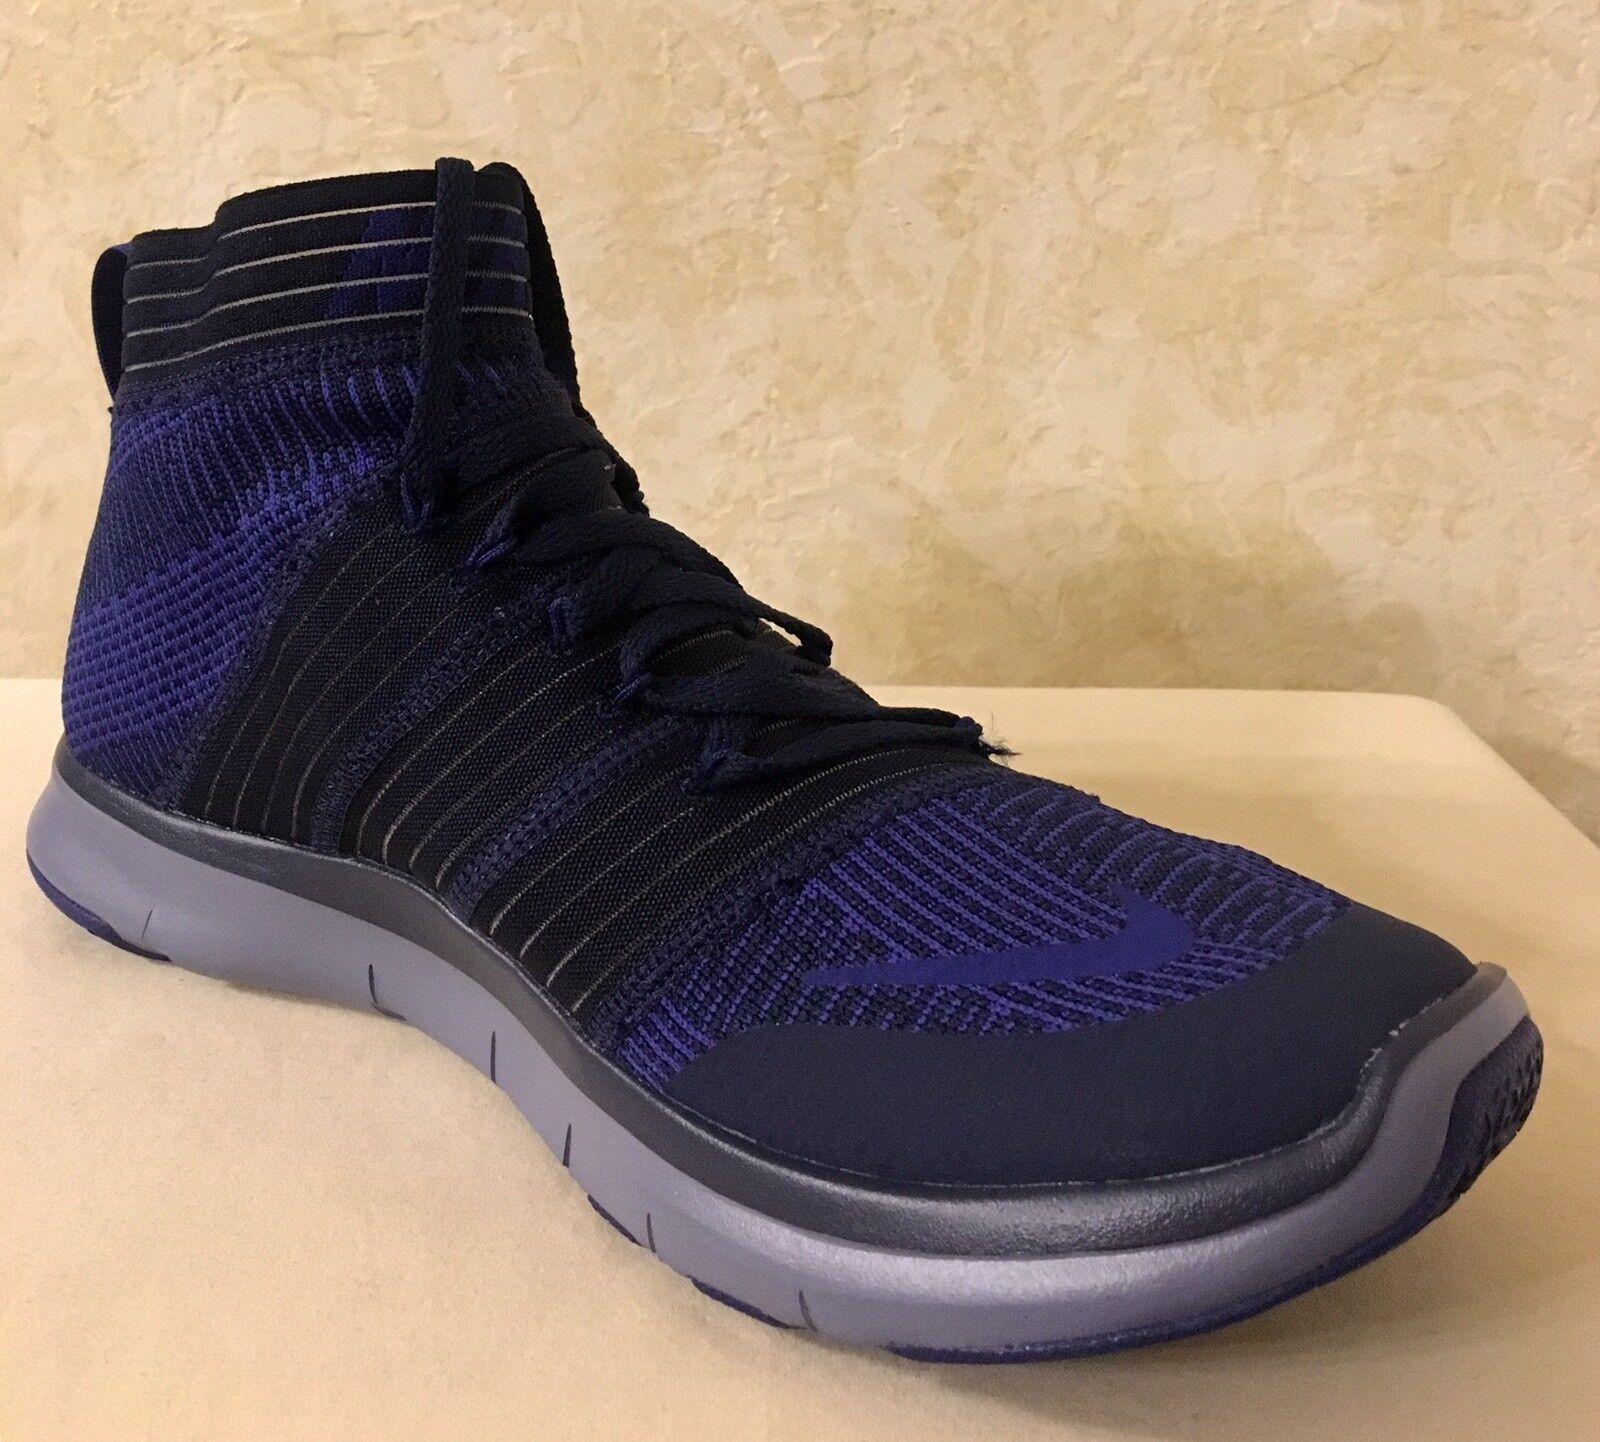 Men Nike Free Train Virtue Training Athletic Navy/Deep Royal Shoes 898052 401 Brand discount Cheap and beautiful fashion